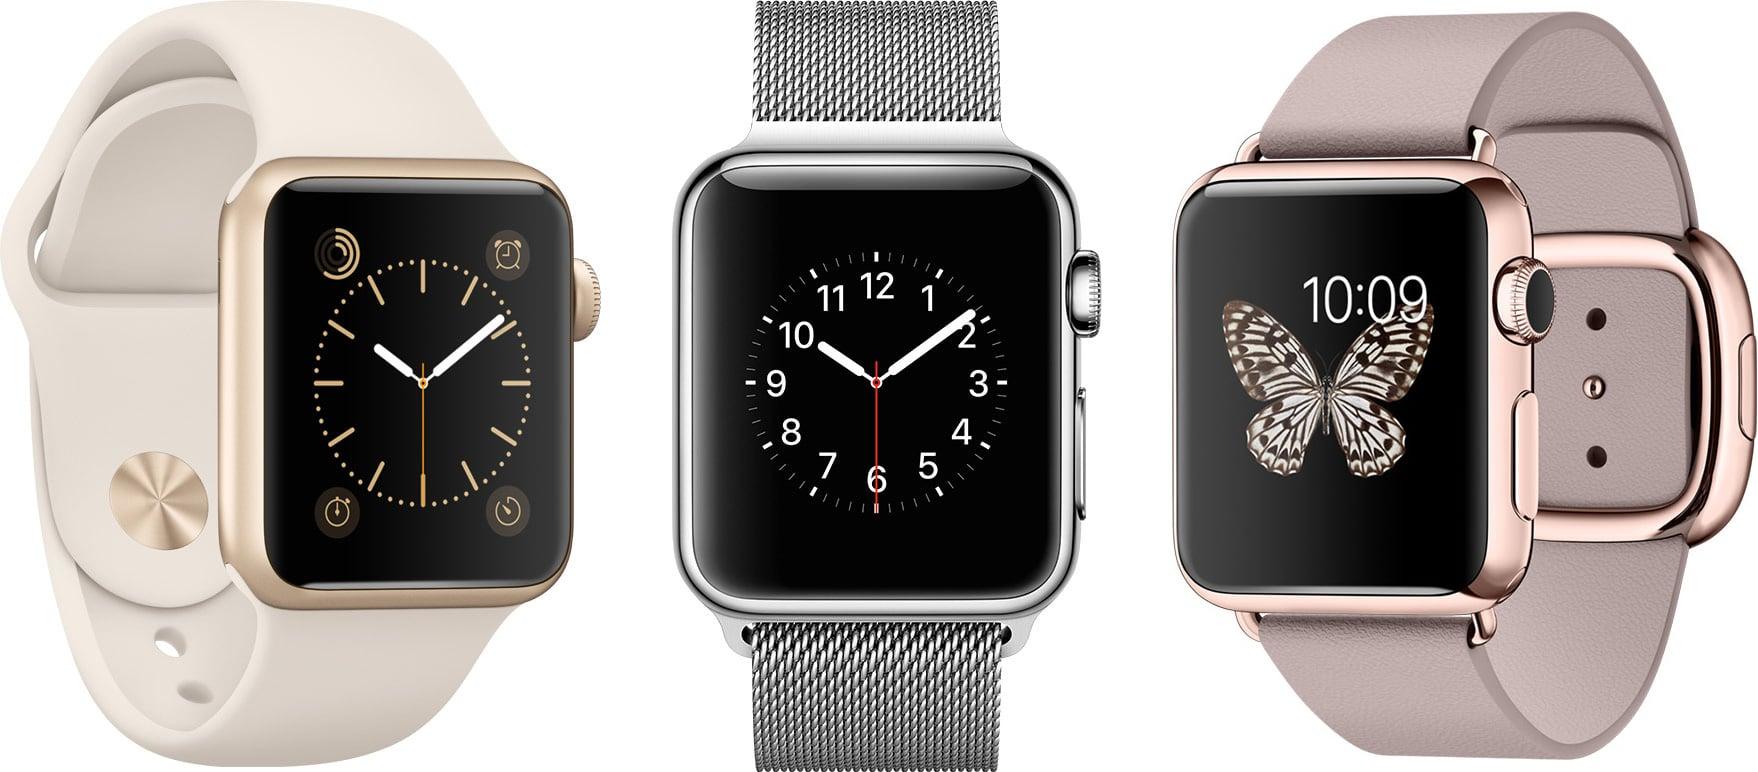 Apple Watches - Sport, Watch e Watch Edition